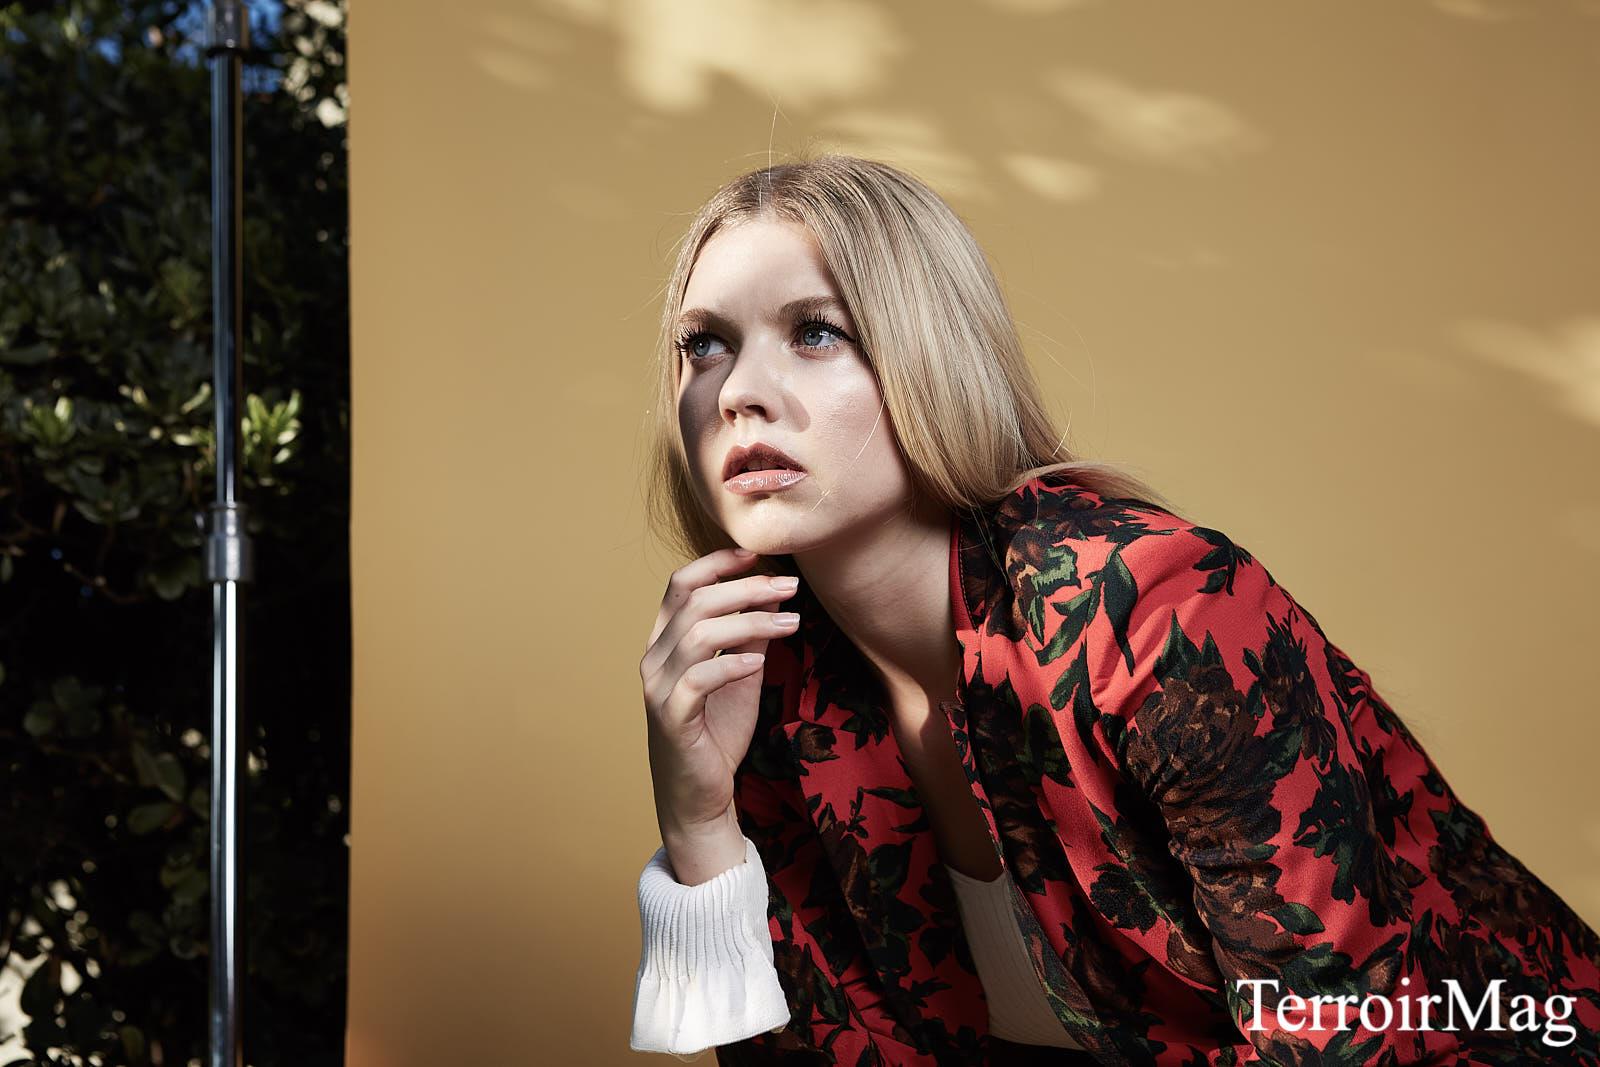 Suit: Zara Top: 3.1 Phillip Lim  Earrings: Caterina Jewelry